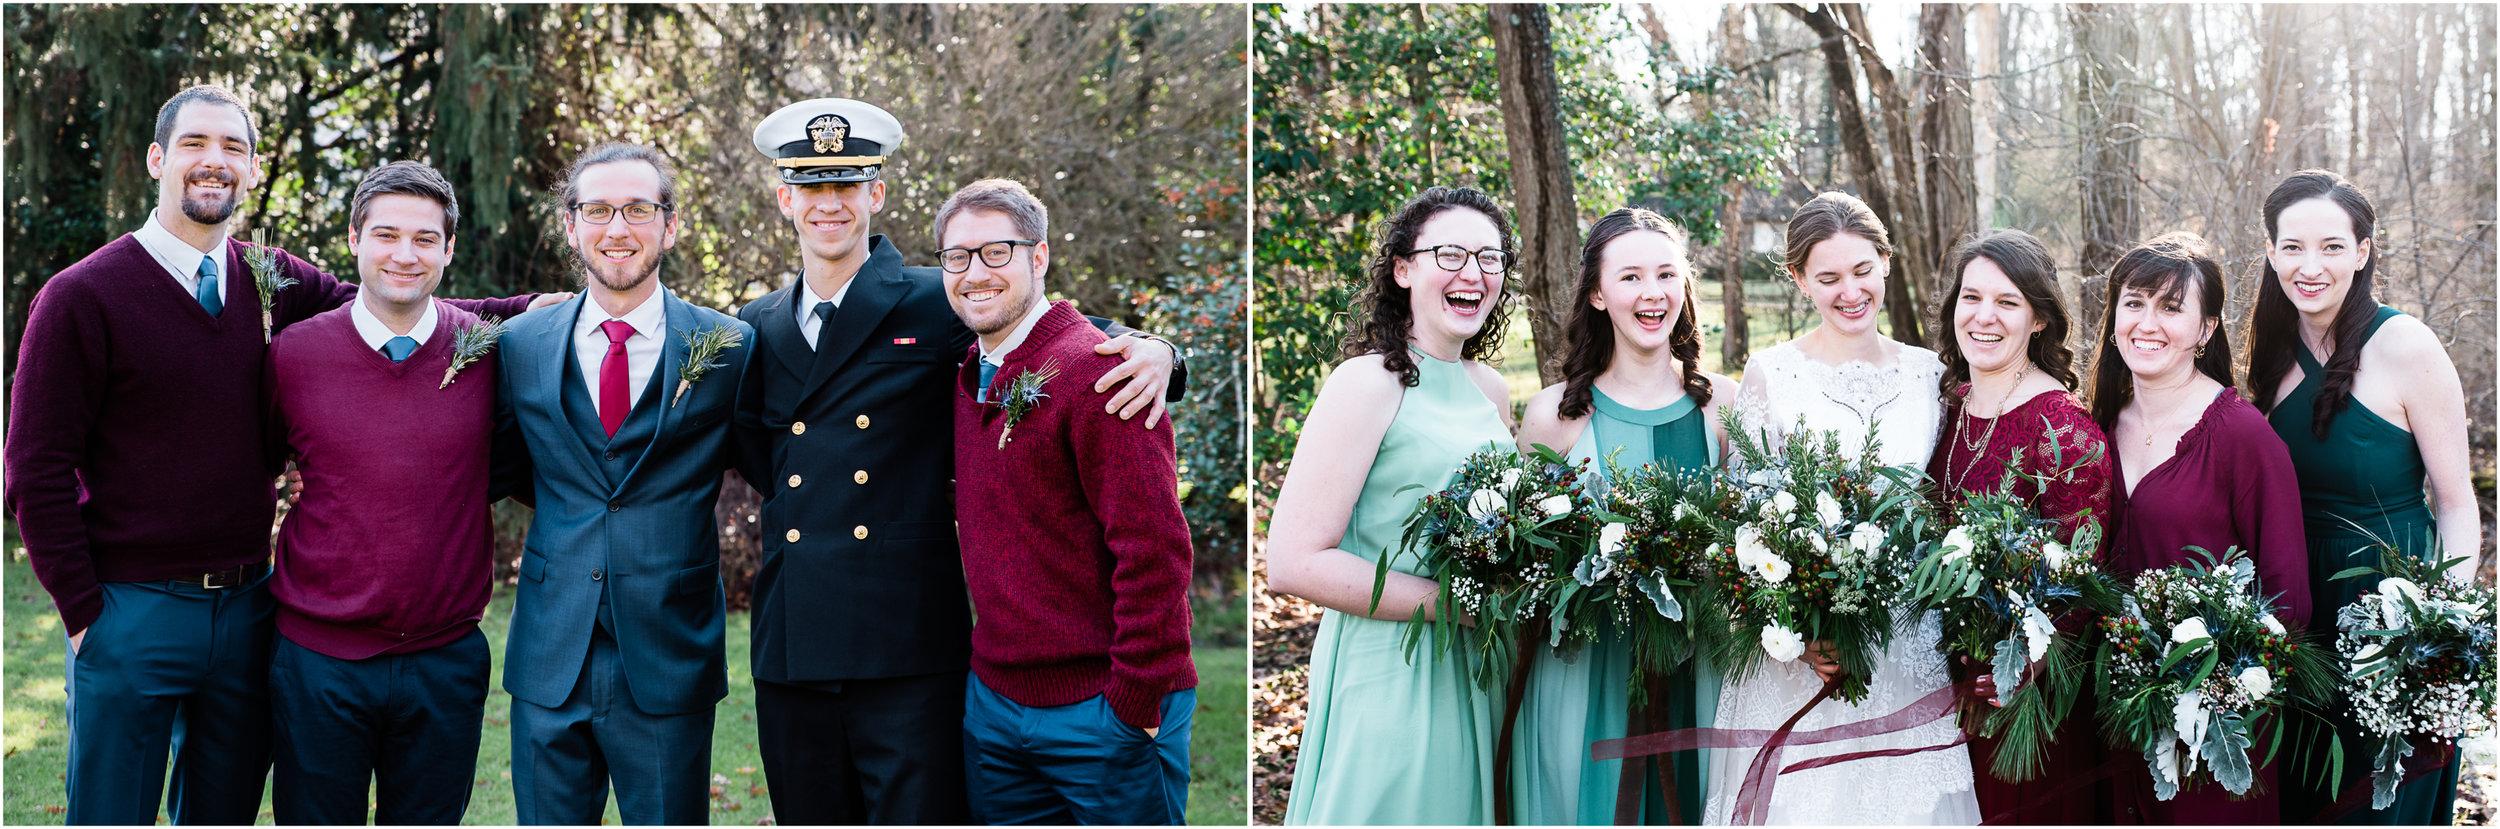 bridal party, linn run, ligonier wedding photographer, mariah fisher.jpg